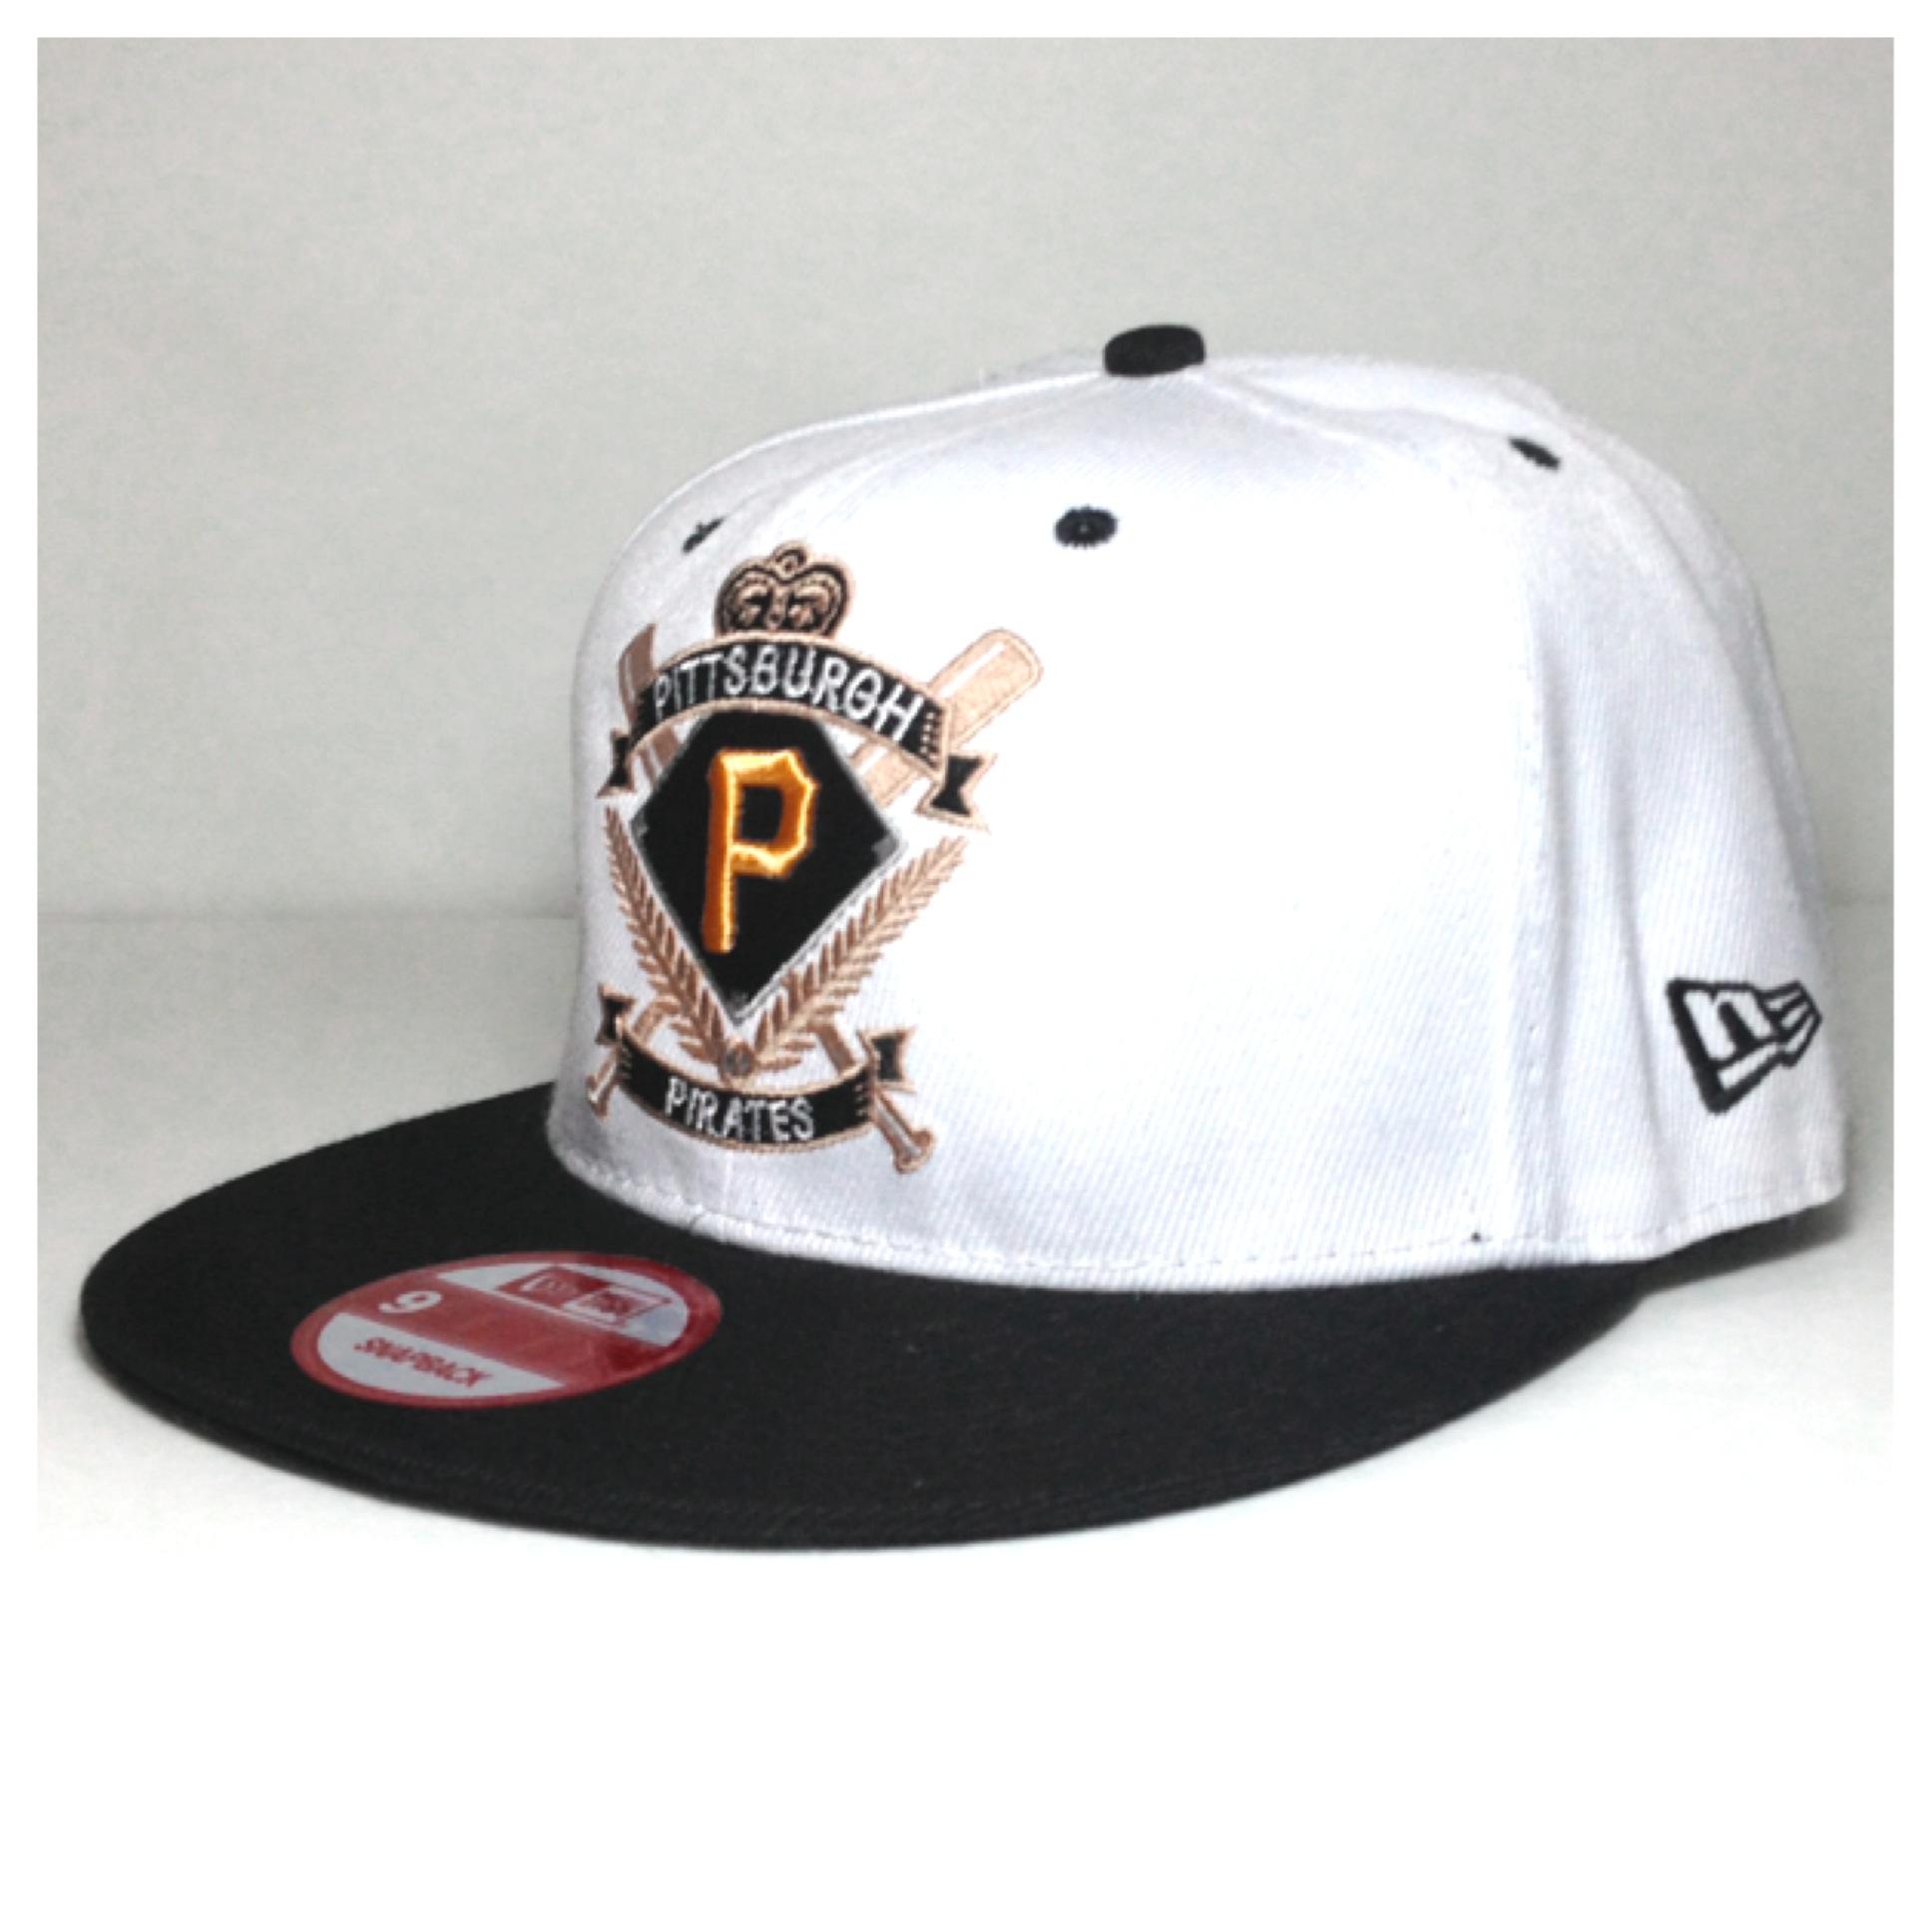 ad3c61e51de 002 MLB Pittsburgh Pirates Snapback · Tiger s Discount Store ...